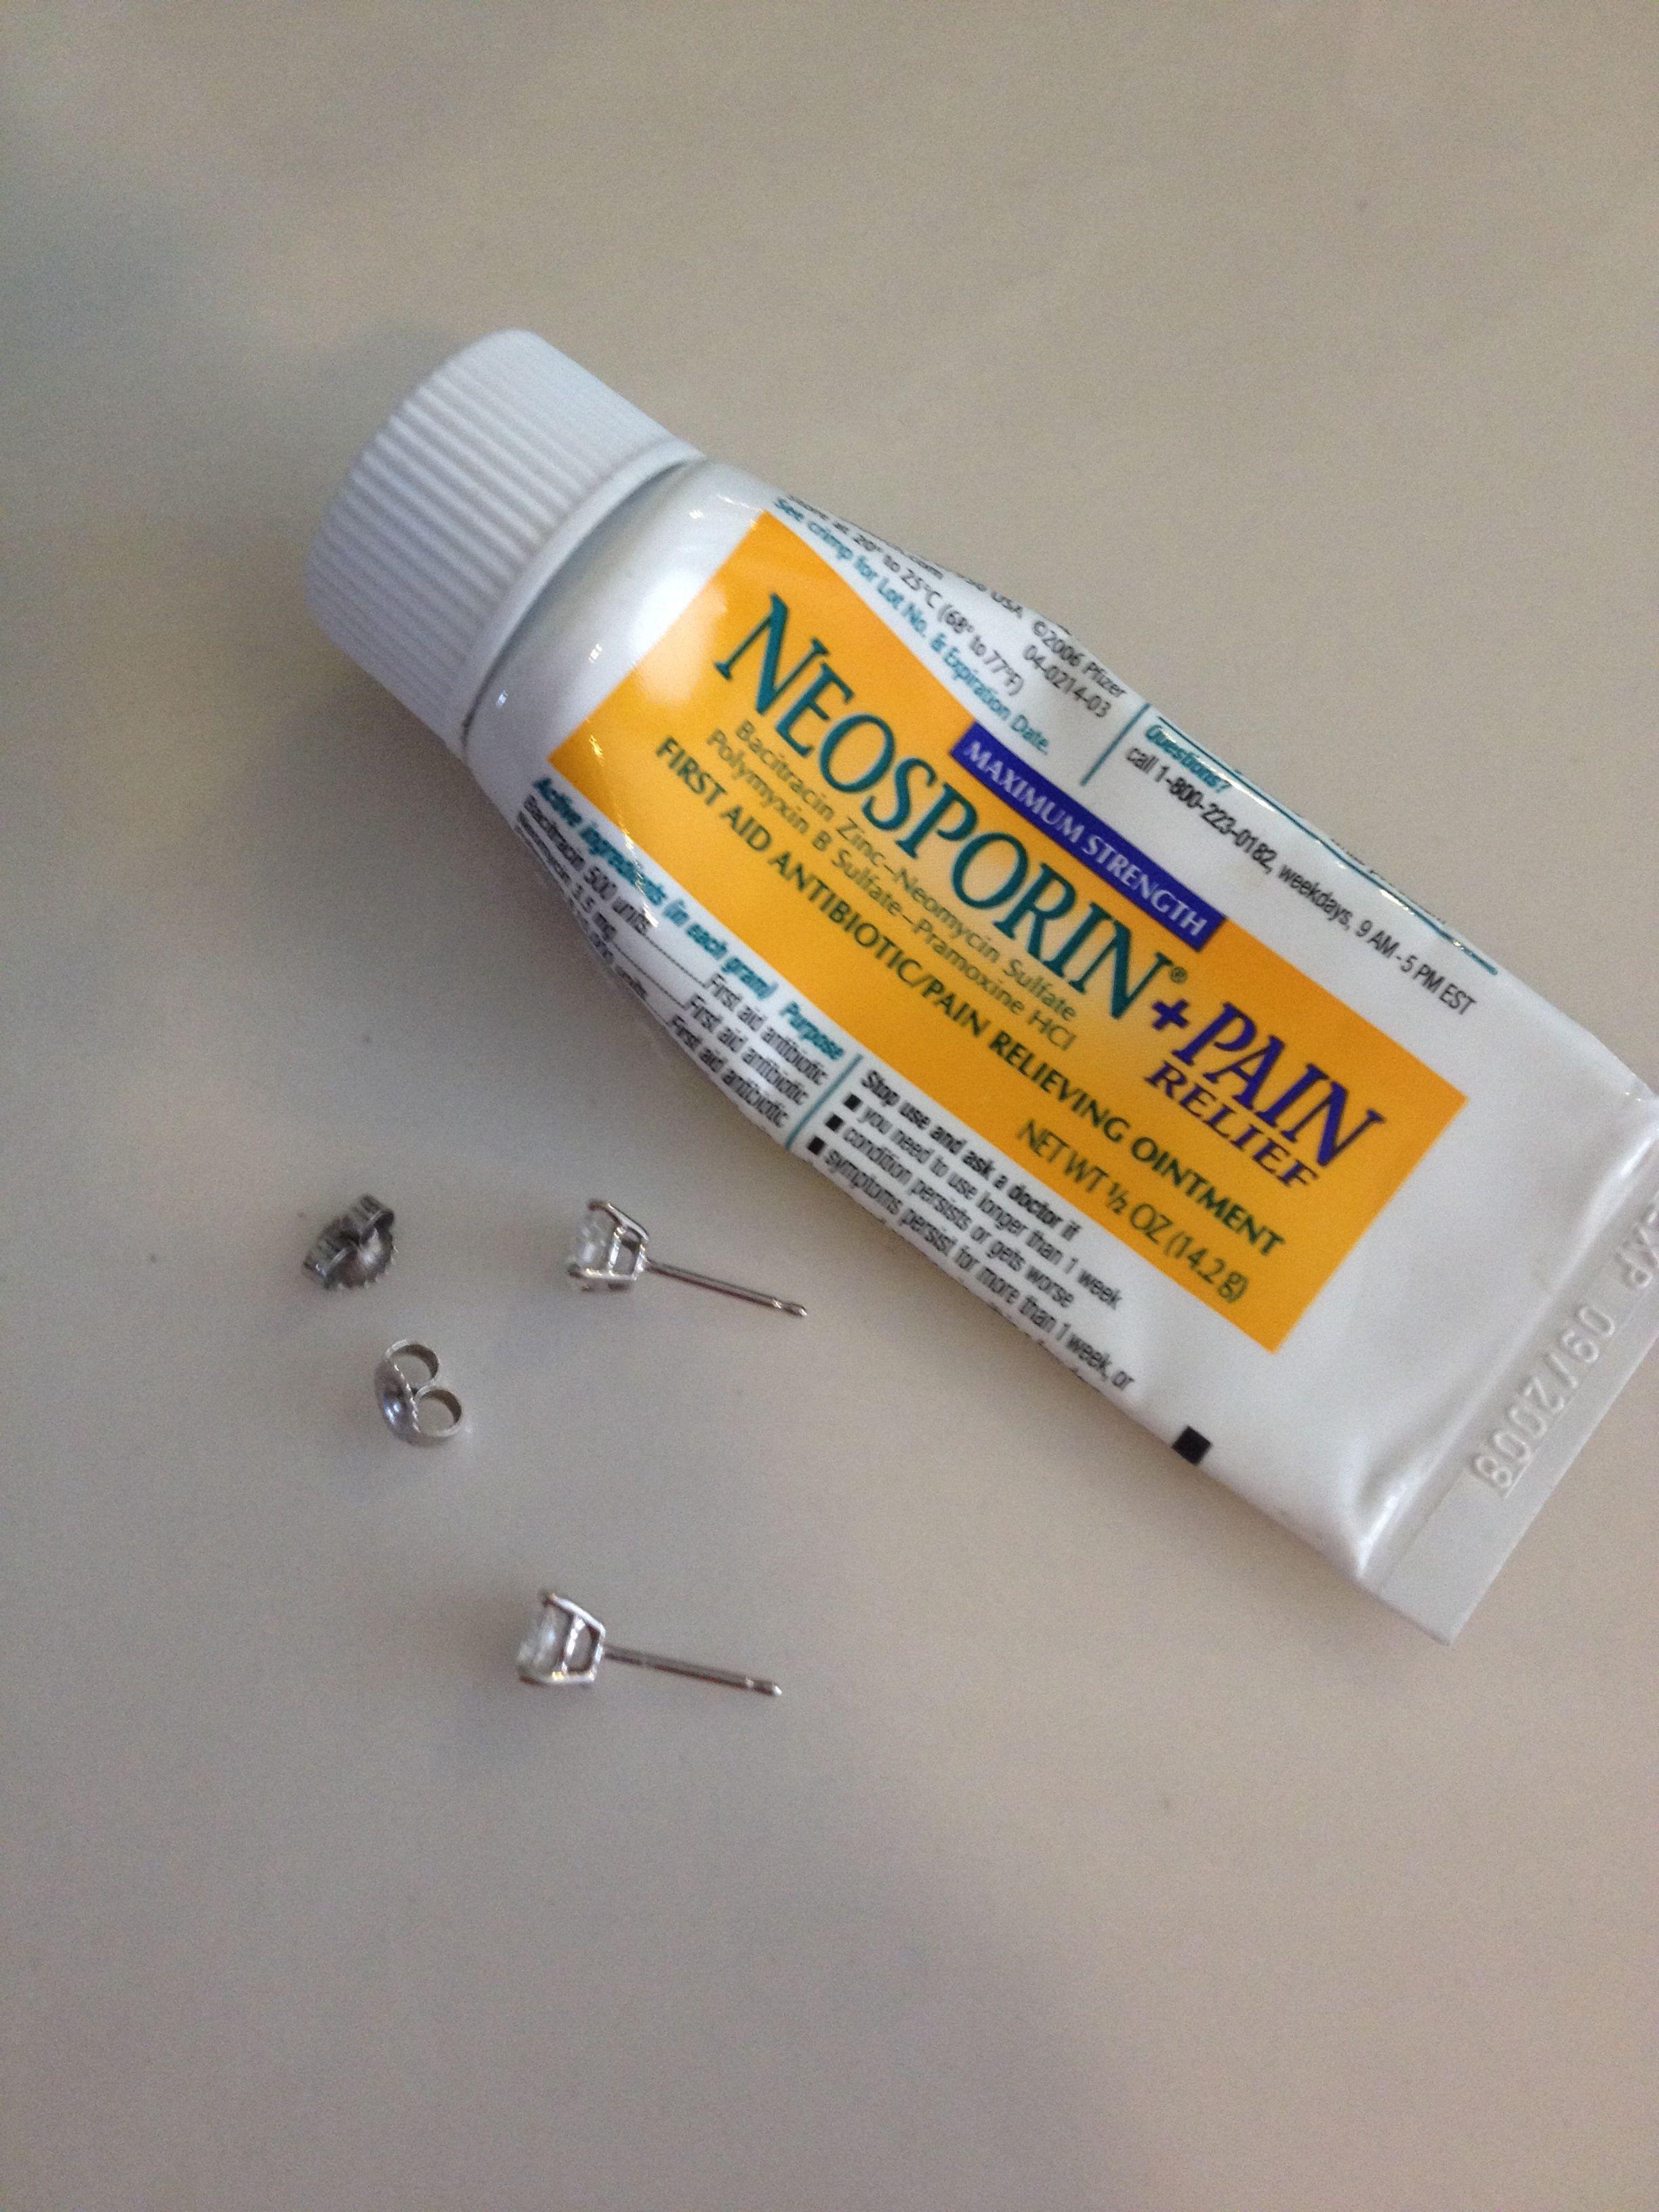 Sensitive ears? Insert tip of earring into Neosporin ...